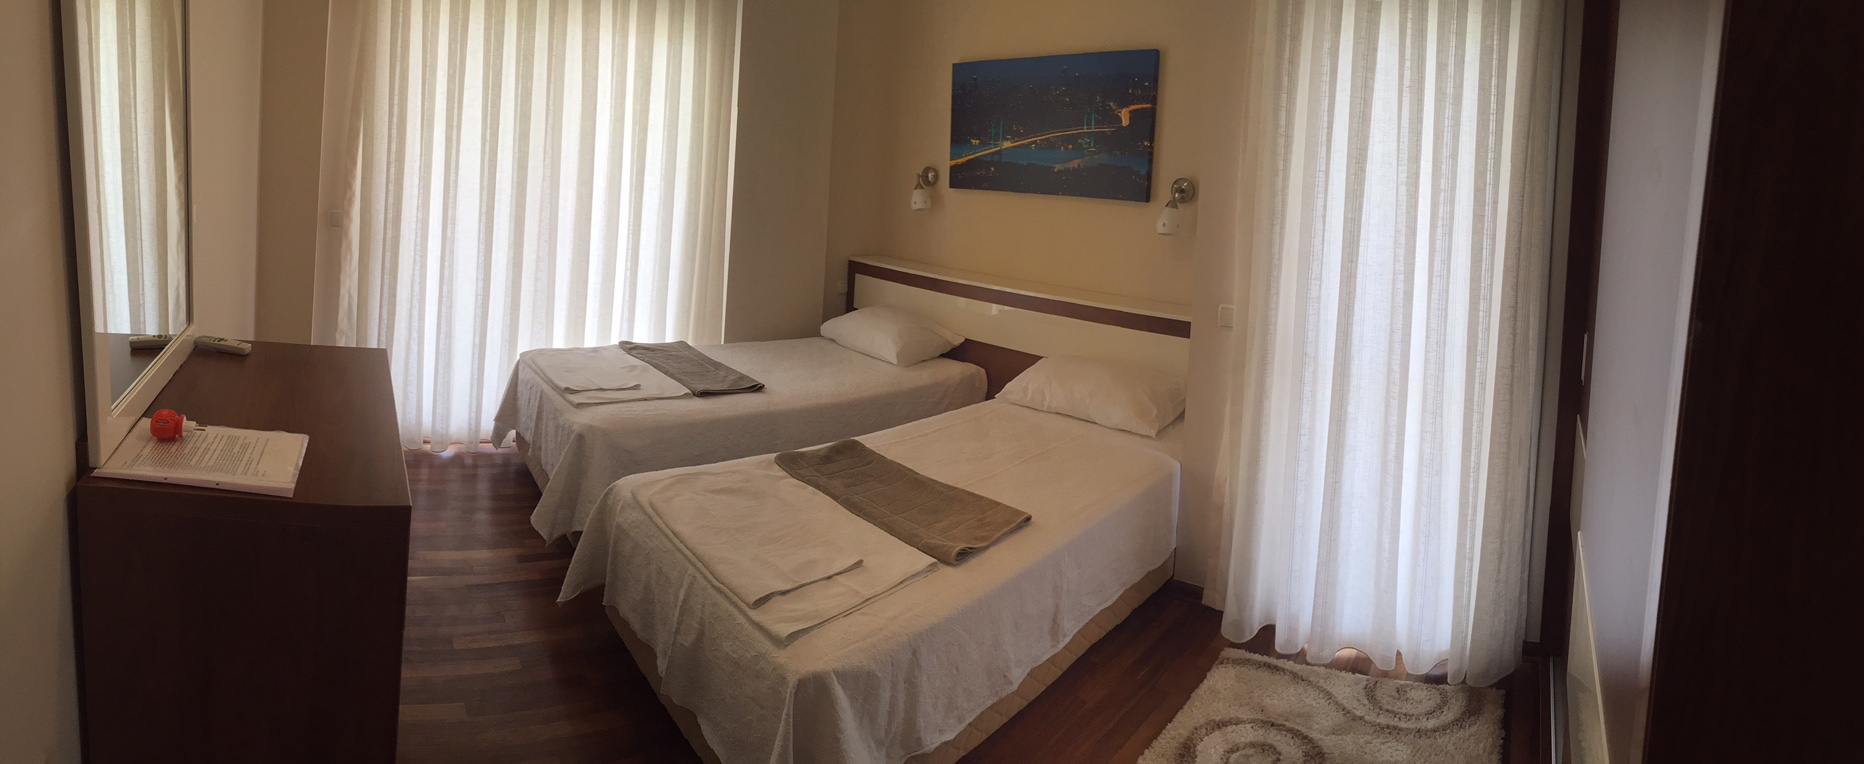 Bedroom 2_Panaromic 2.JPG